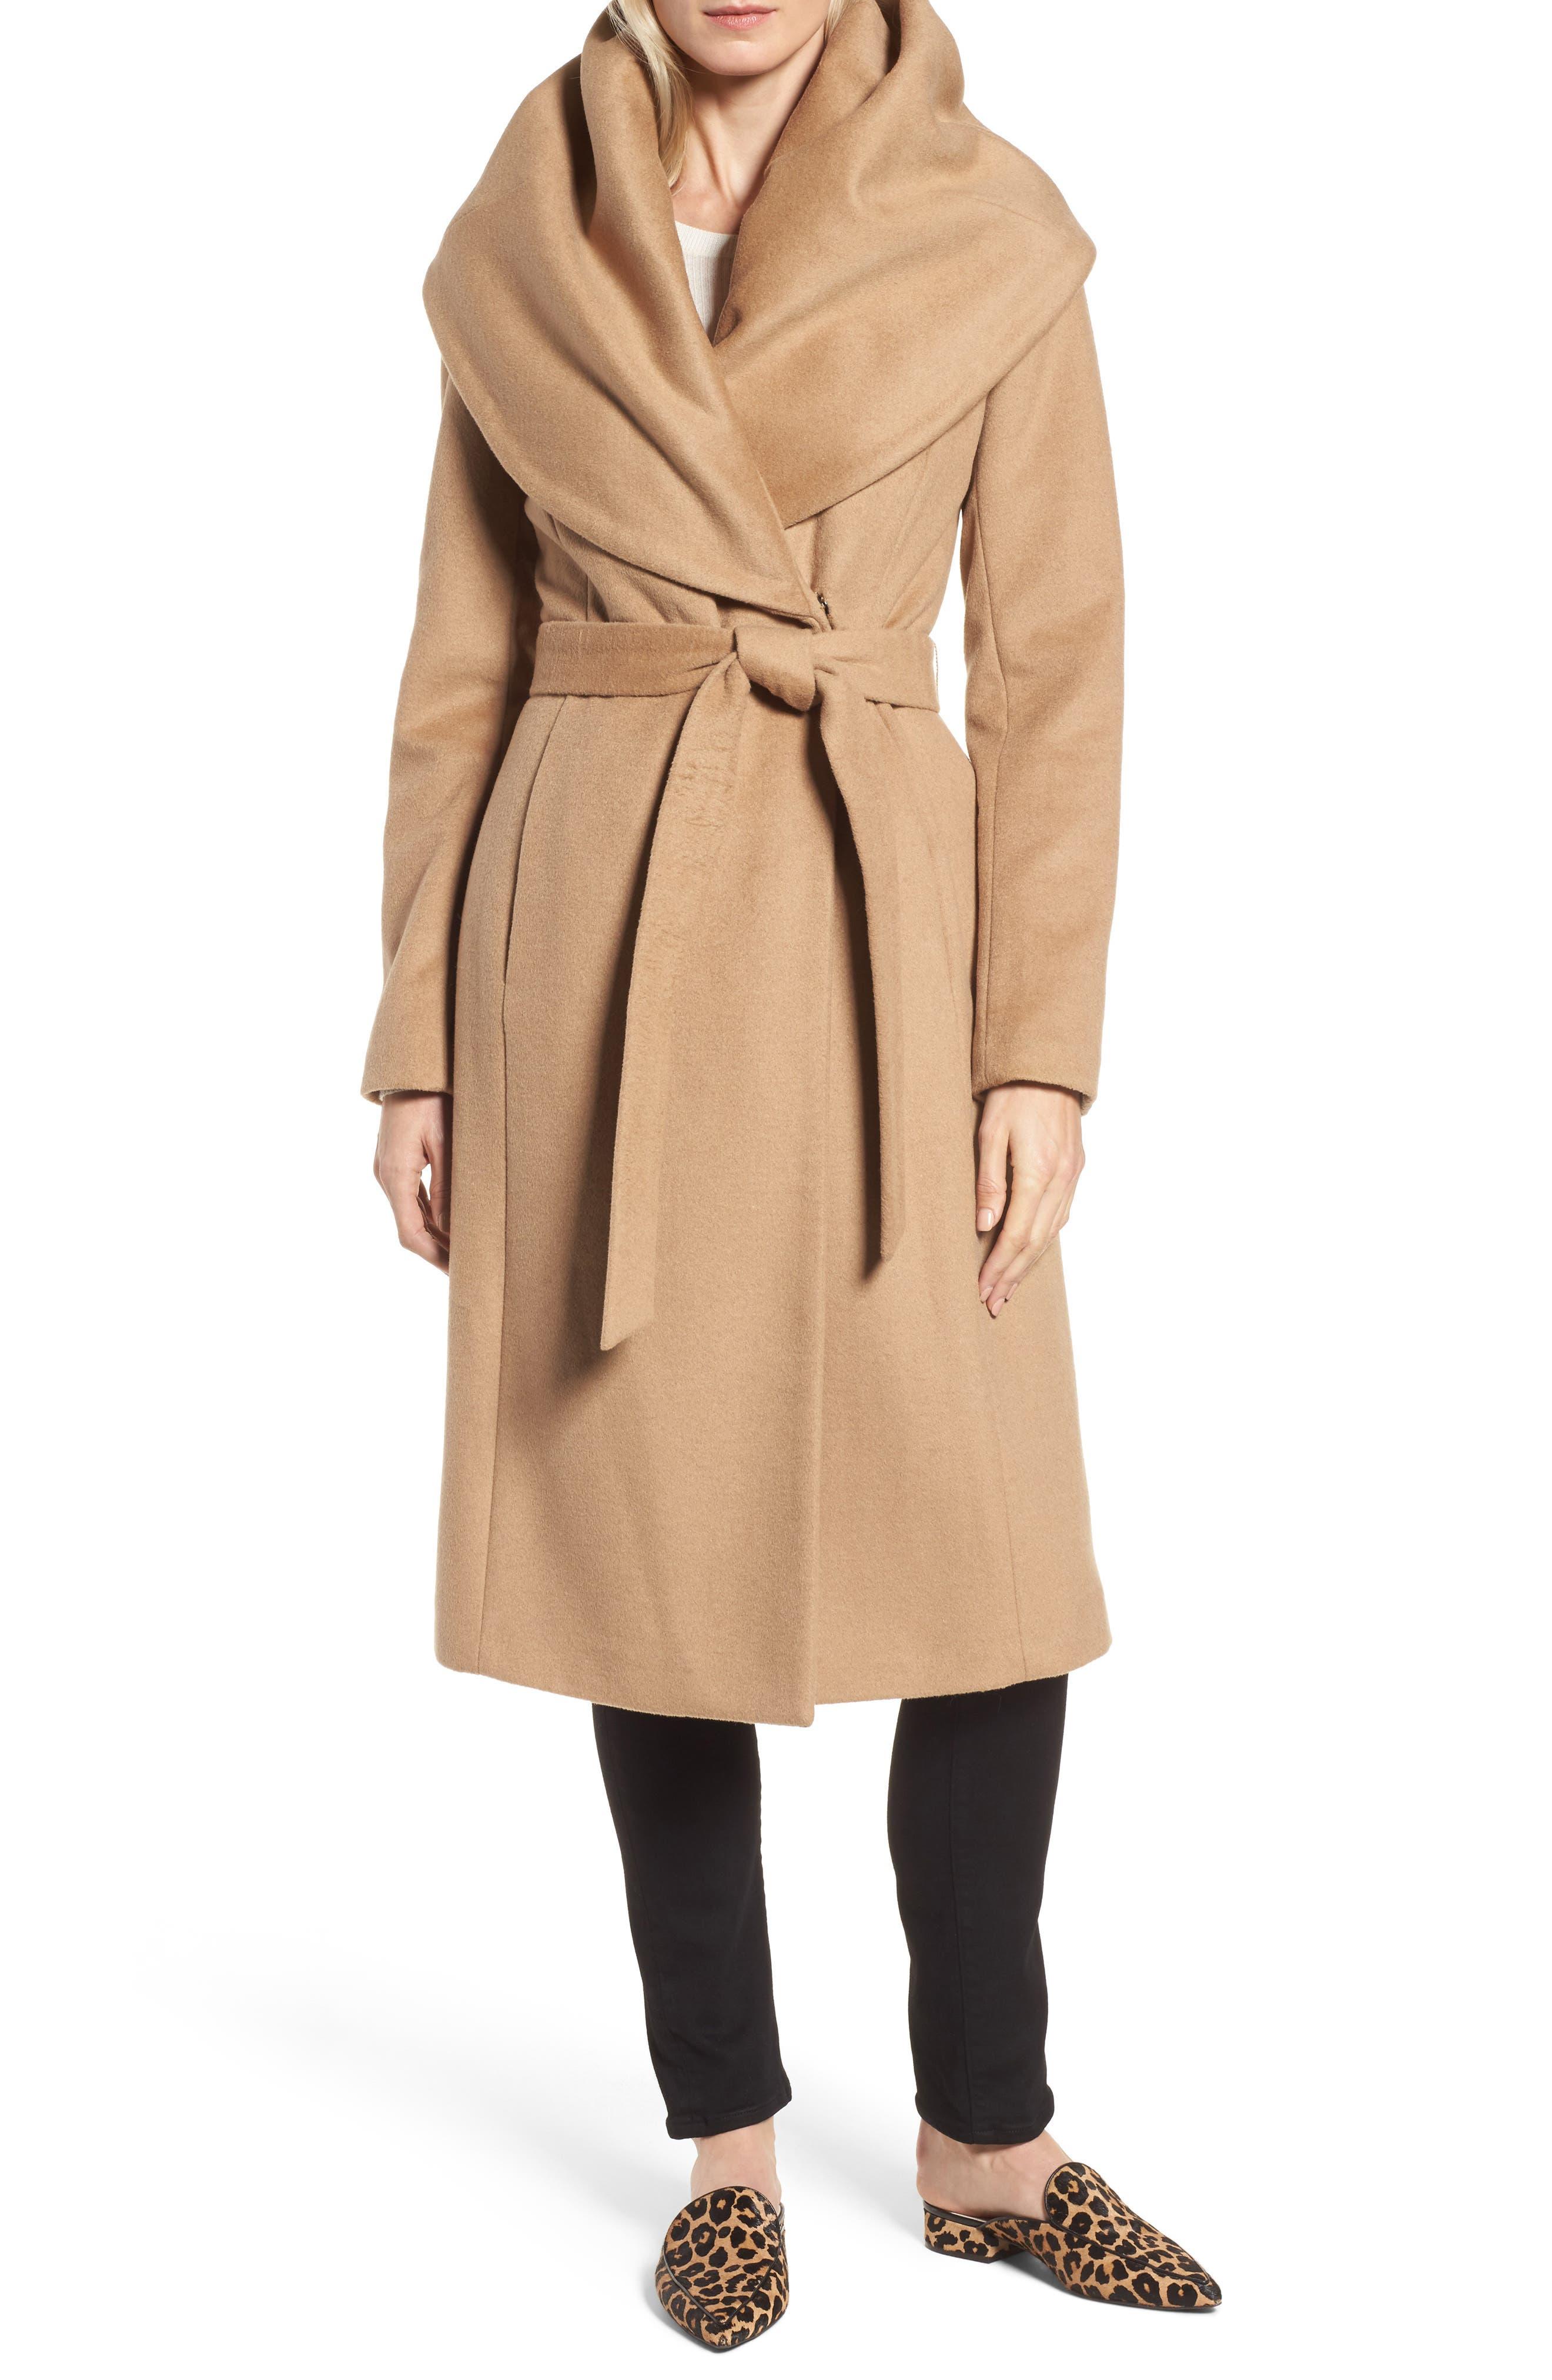 DKNY Wool Blend Shawl Collar Wrap Coat,                         Main,                         color, Camel